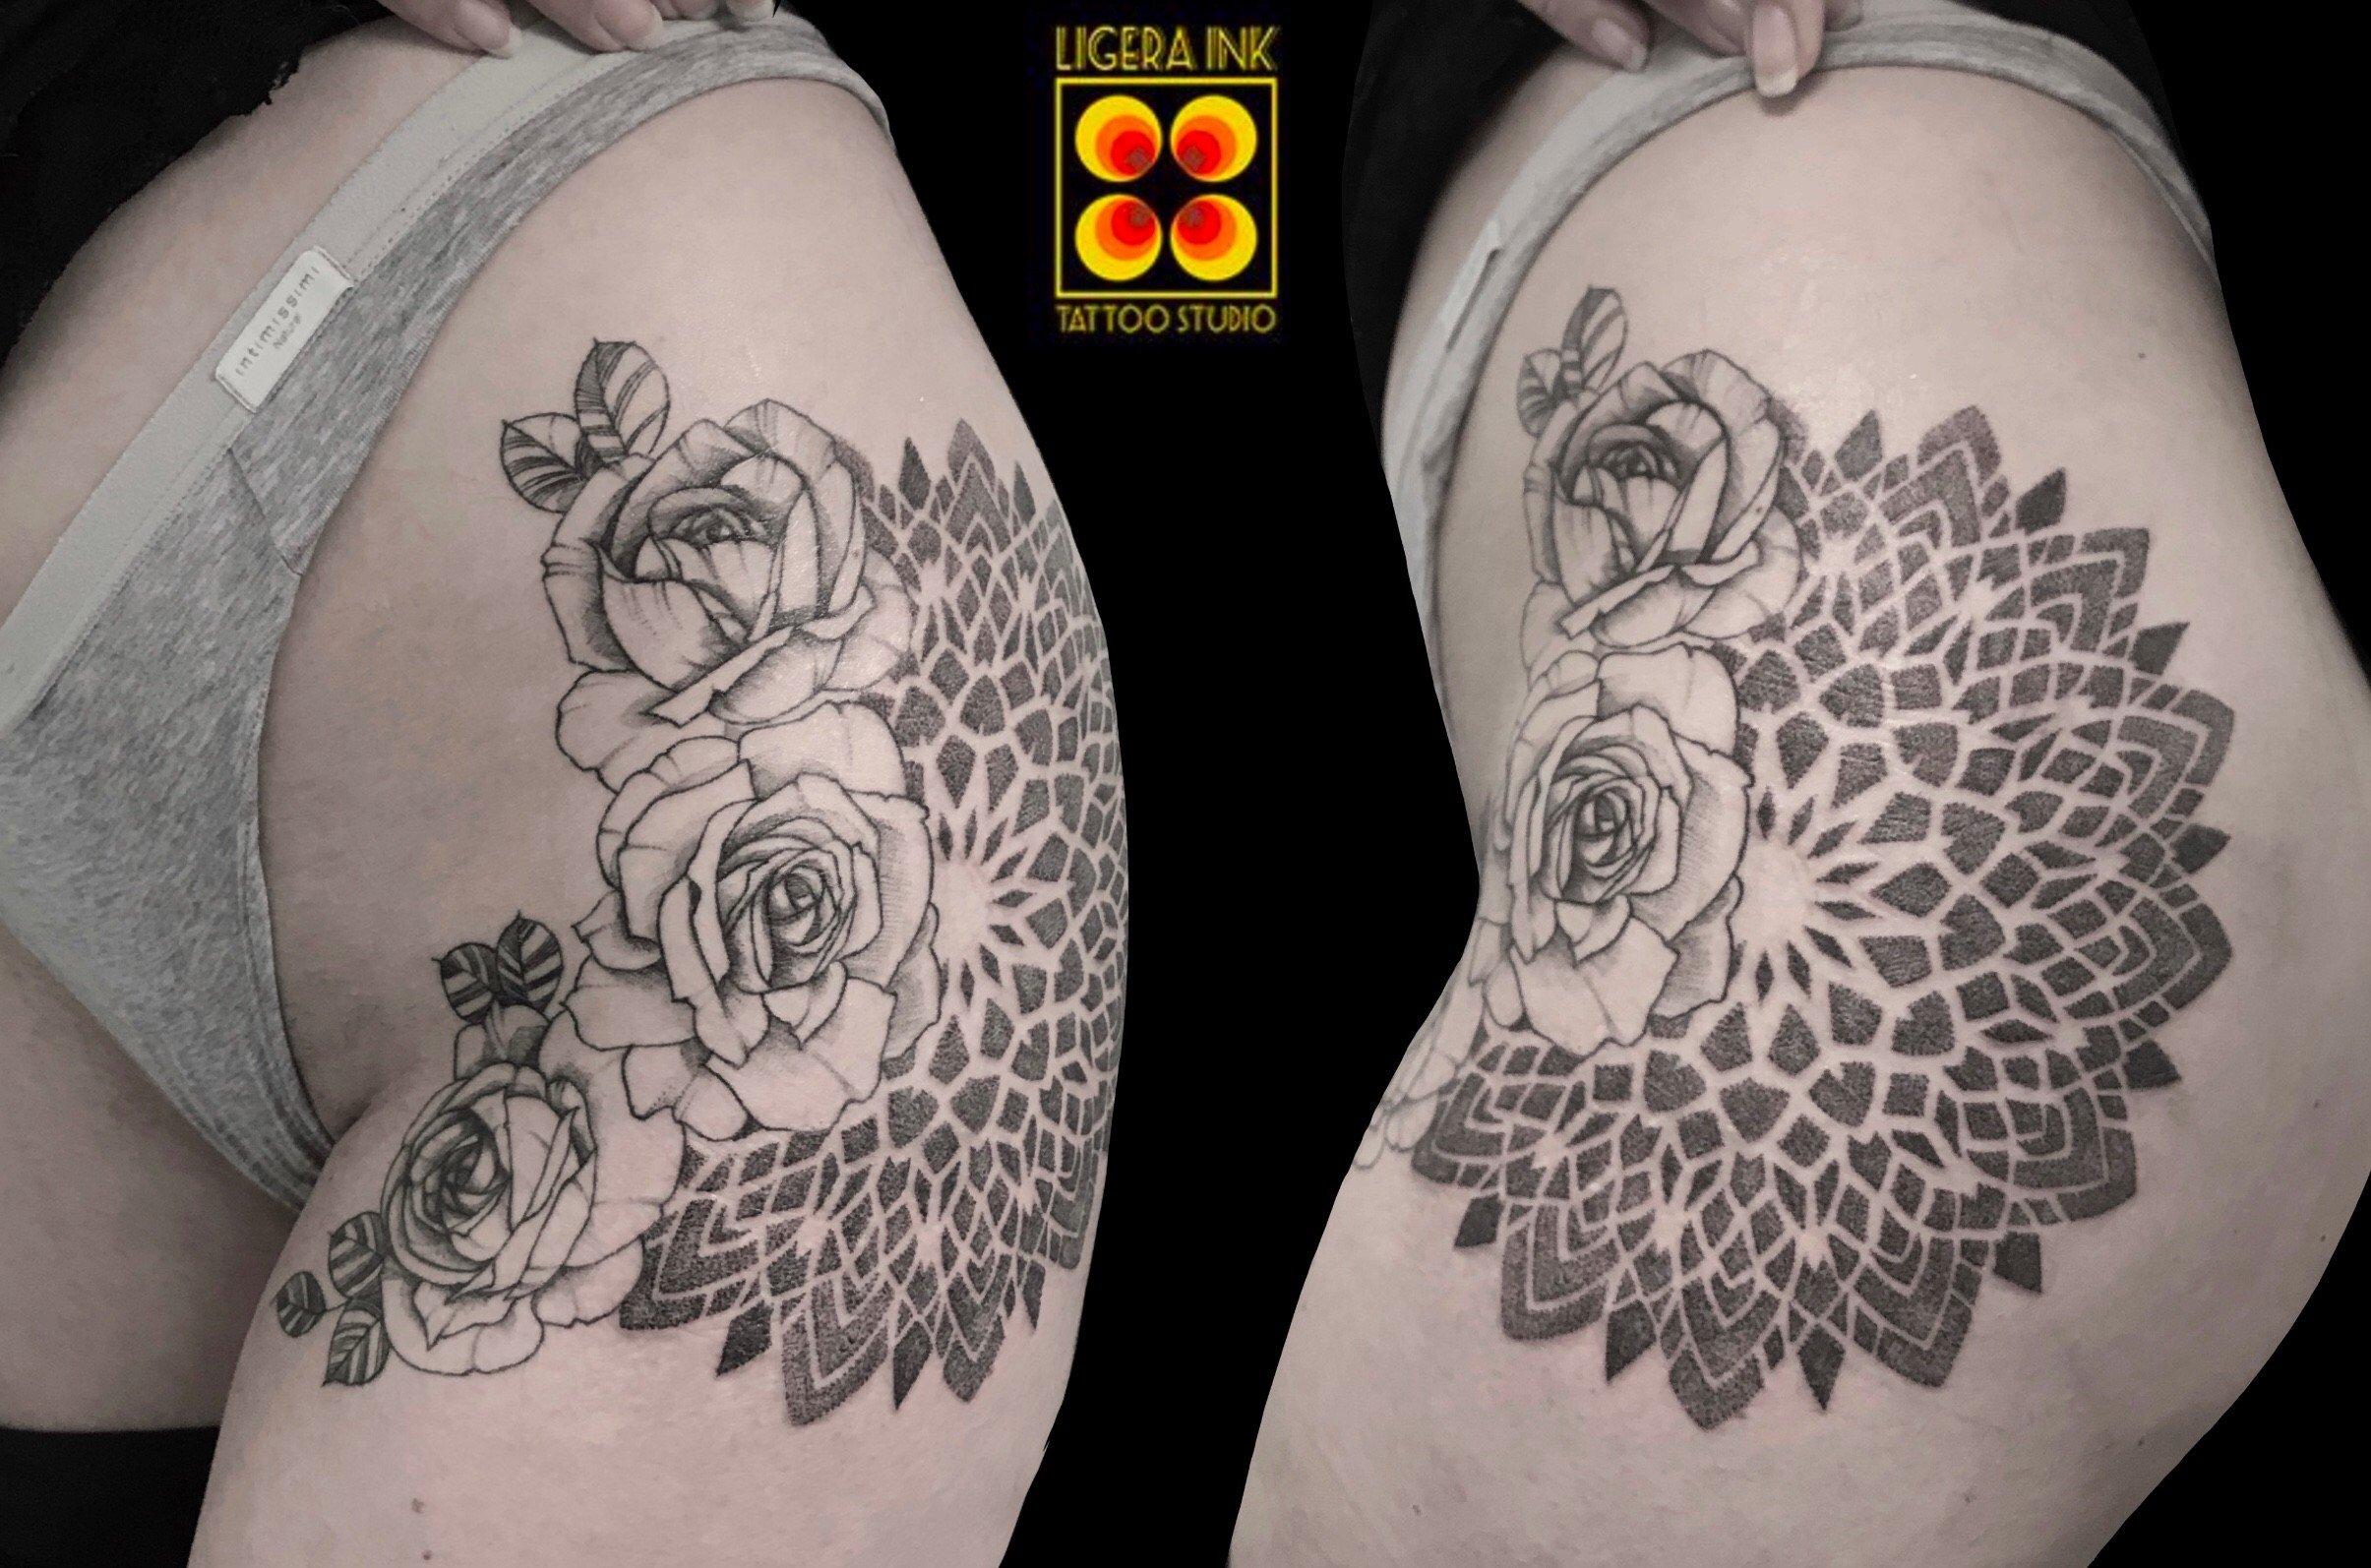 Ligera-ink-tattoo-milano-tatuaggi-milano-migliori-tatuatori-milano-tattoo-blackwork-milano-tatuaggi-blackwork-milano-tatuaggio-mandala-tattoo-mandala-blackwork-milano